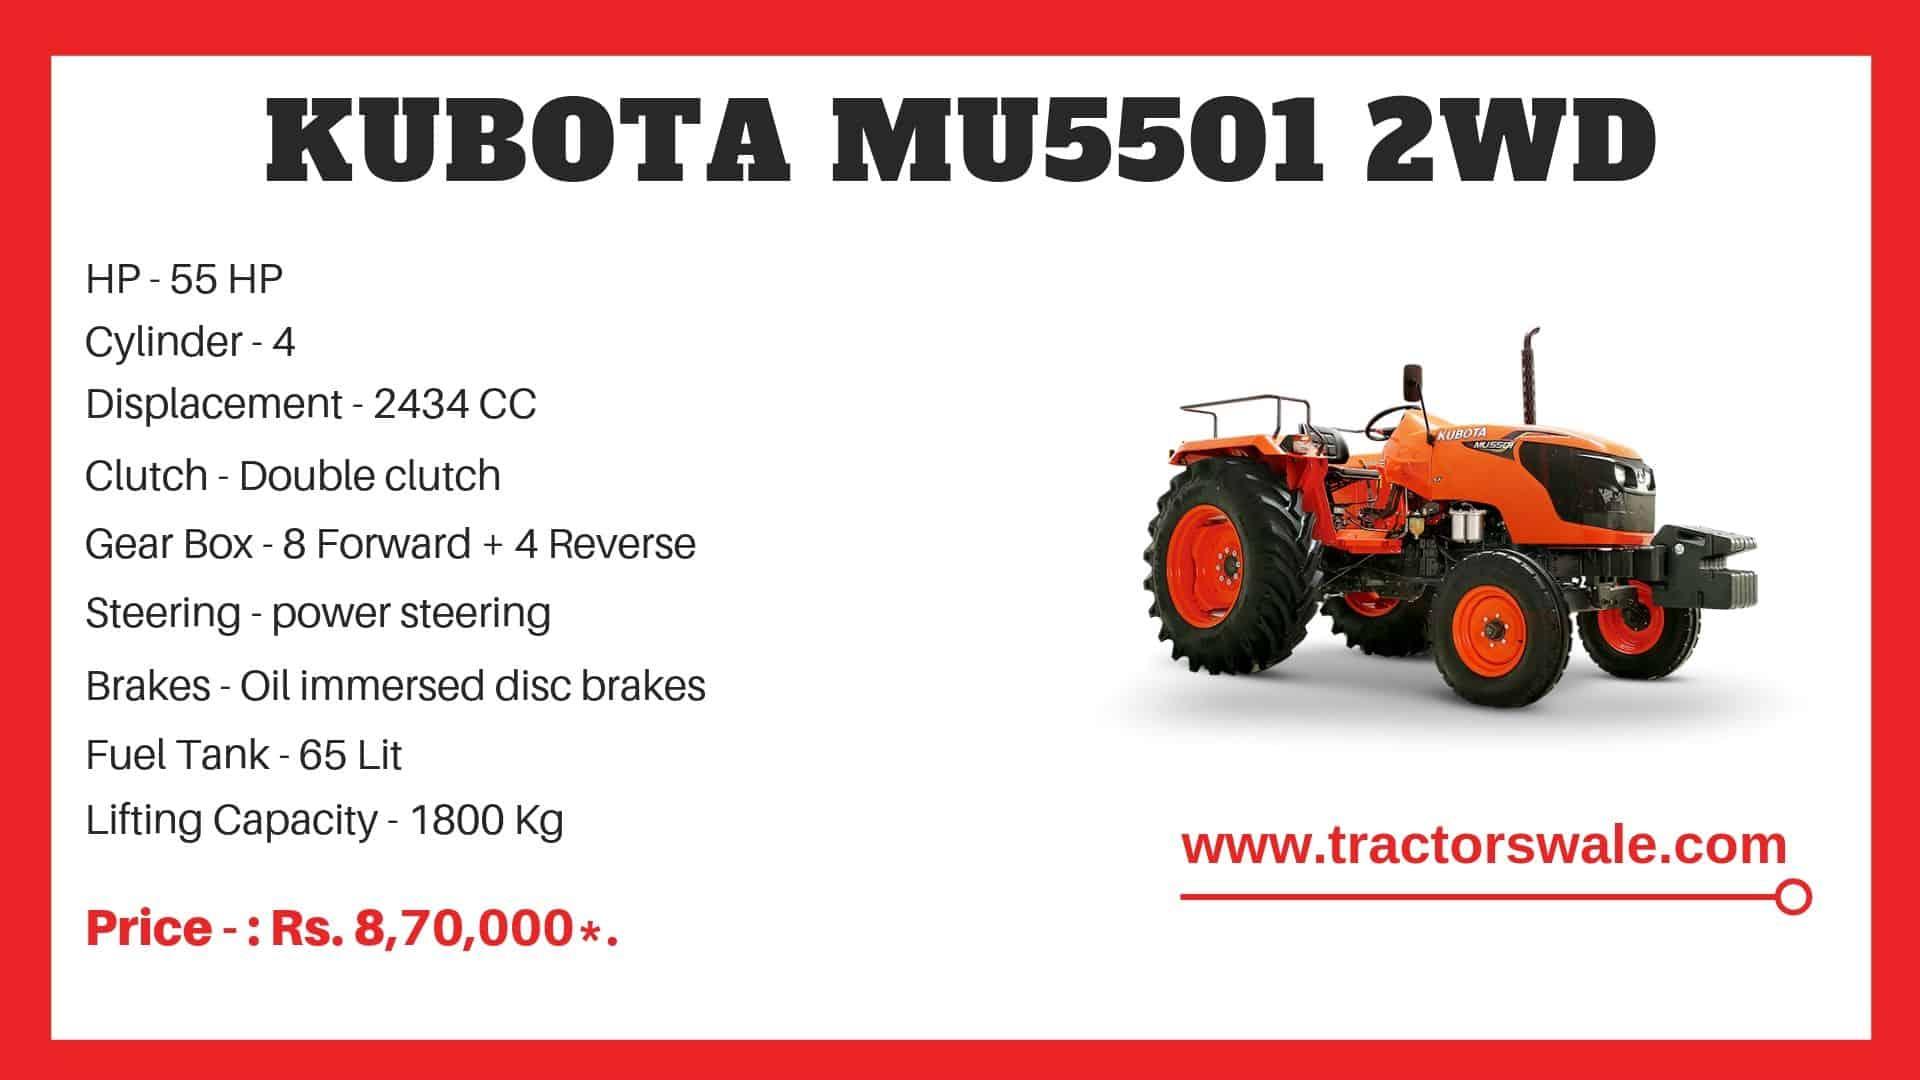 Specification of Kubota MU5501 2WD